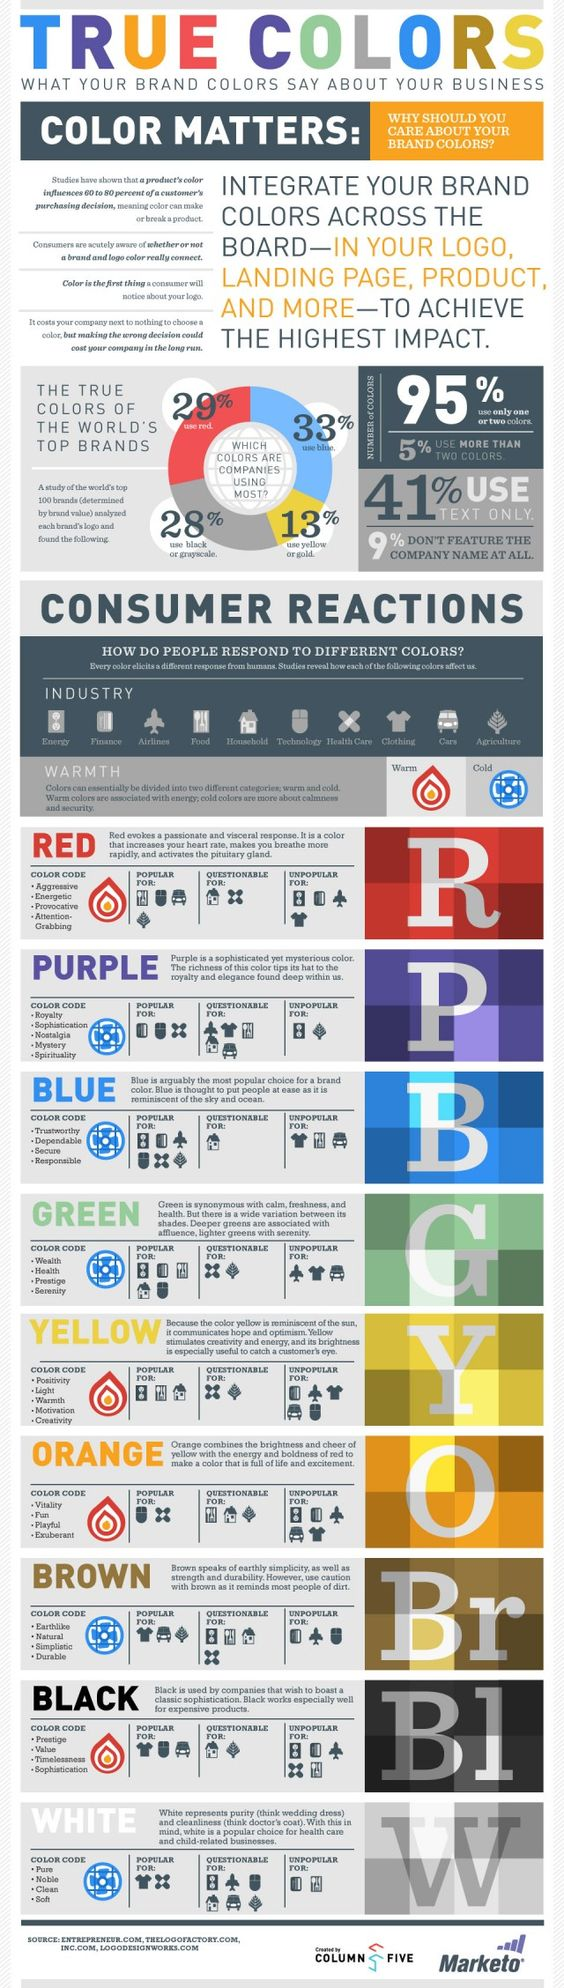 What Colors Say About Your Brand: Info Graphic, Color Matter, True Colour, Website, True Color, Web Site, Brand Colour, Infographic